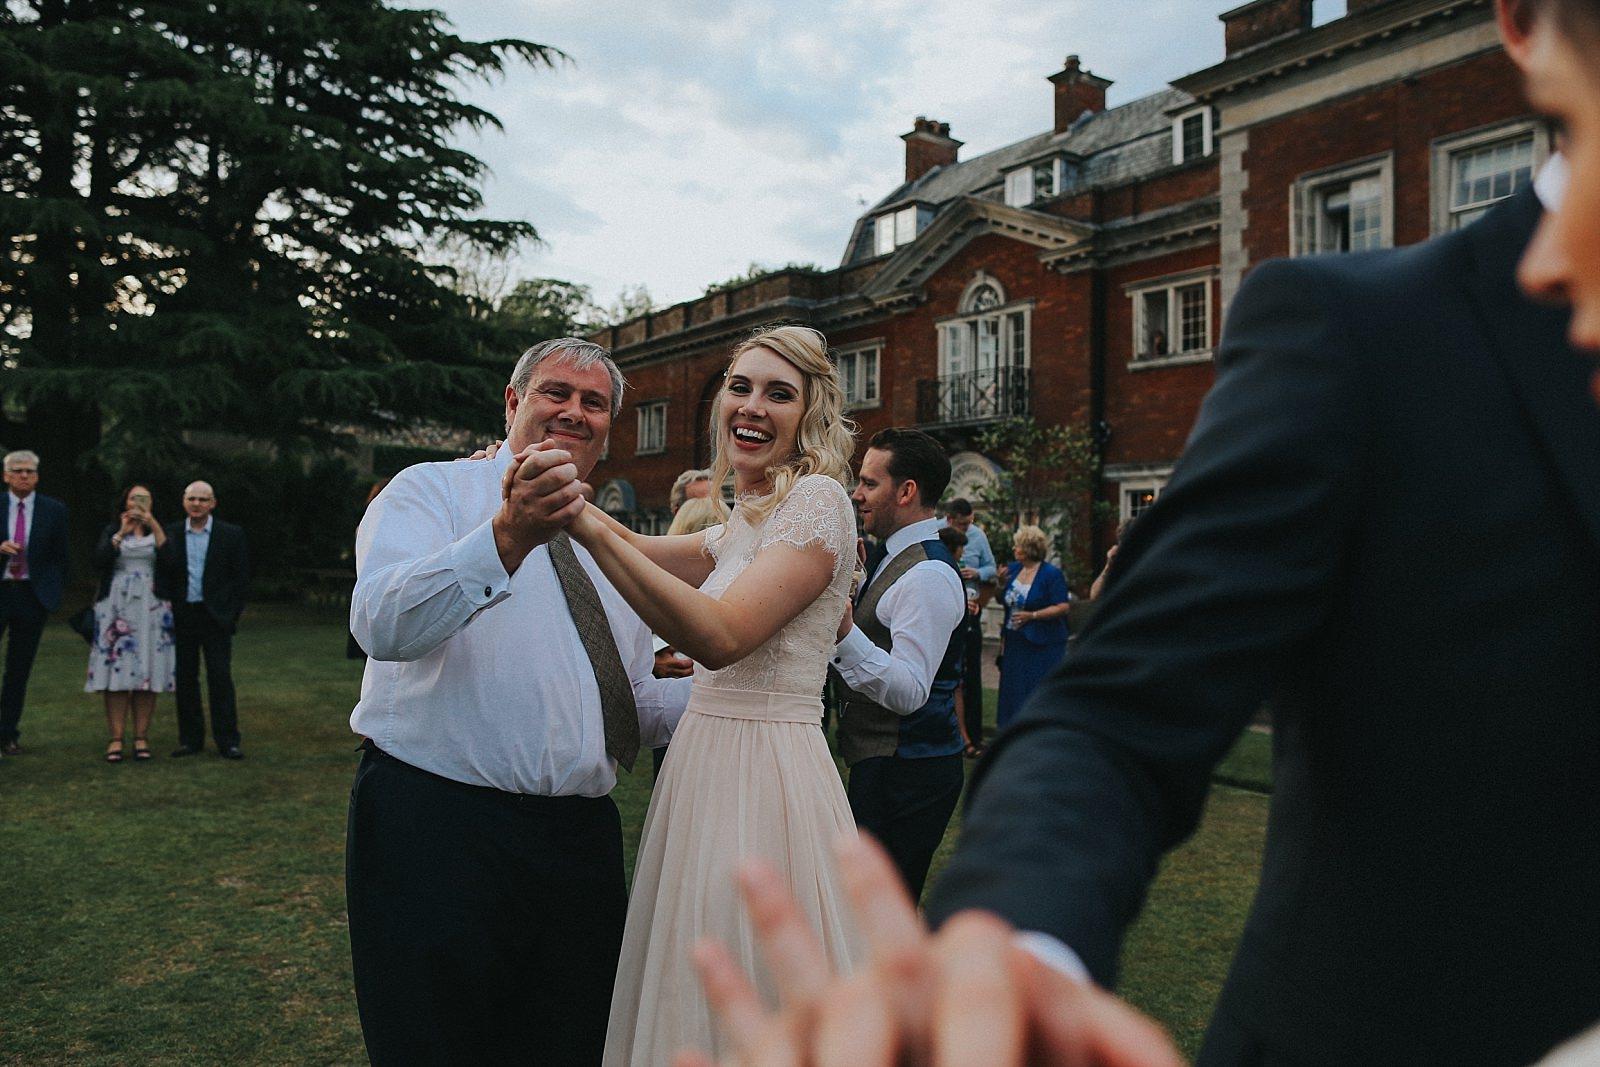 bridesmaid dances with her dad